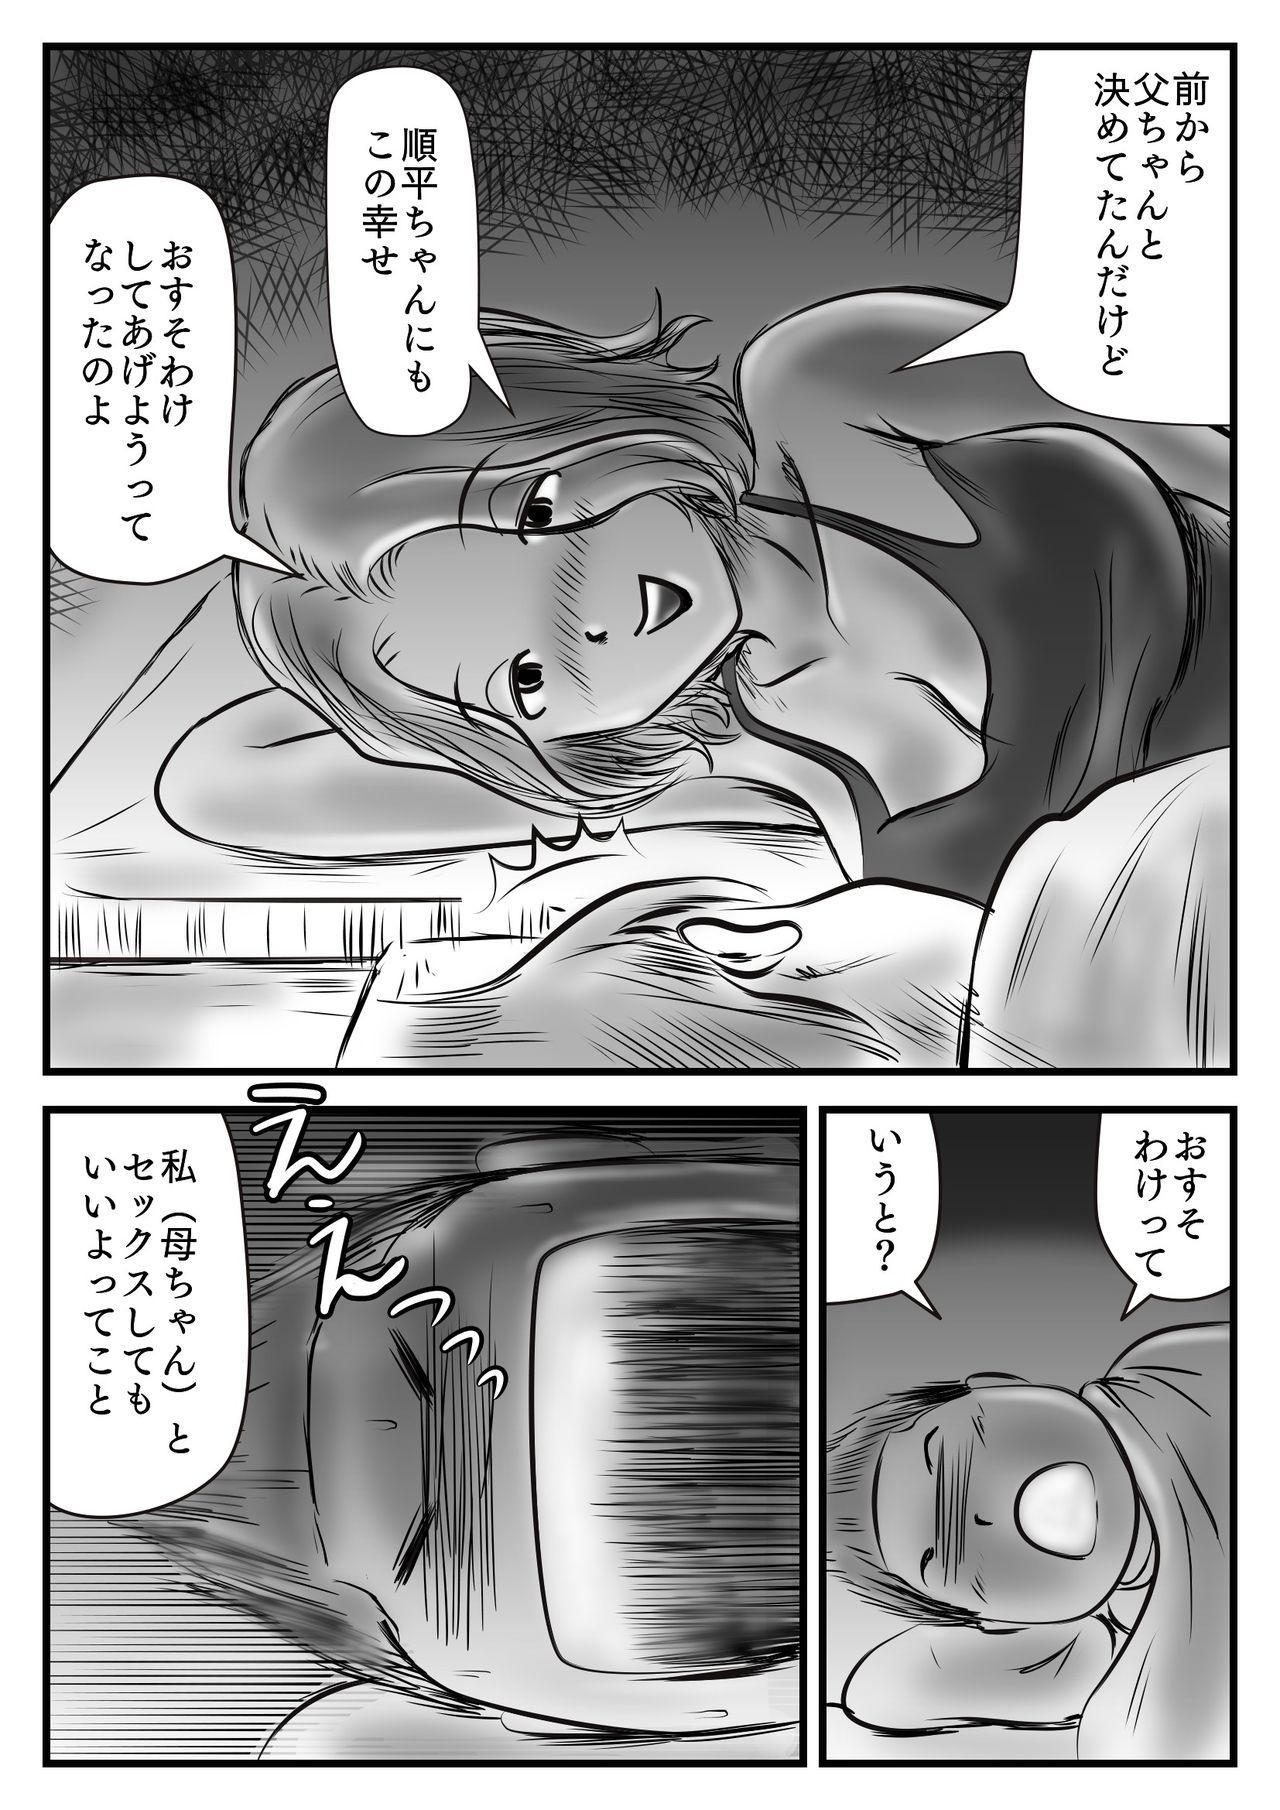 Owabi to Iccha Nanda ga Kaa-chan Daku? 12